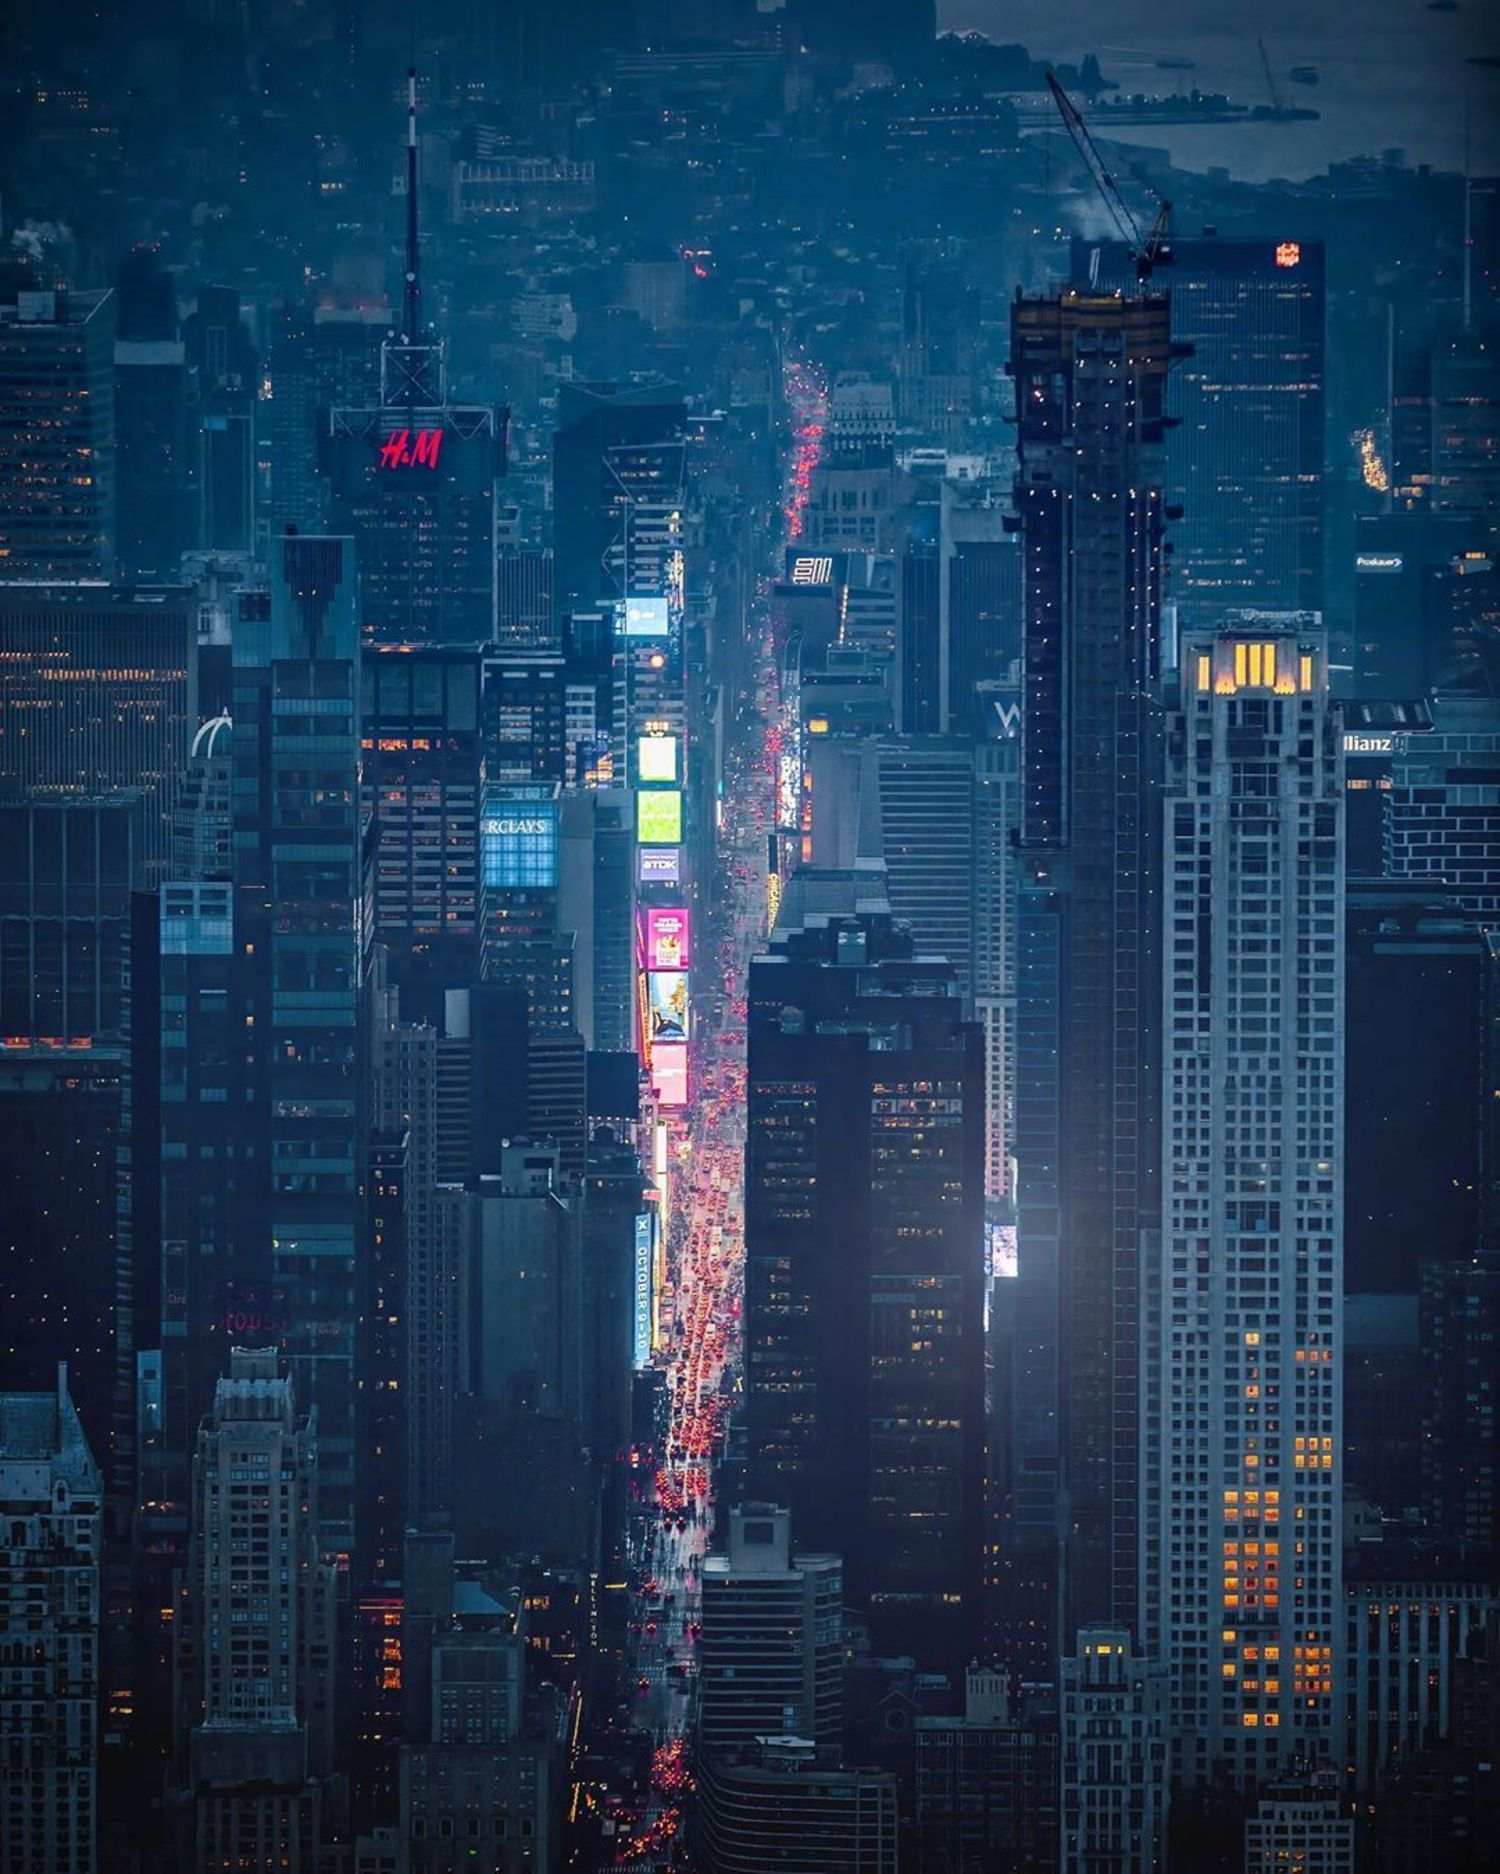 Times Square, Manhattan. Photo via @beholdingeye @flynyon